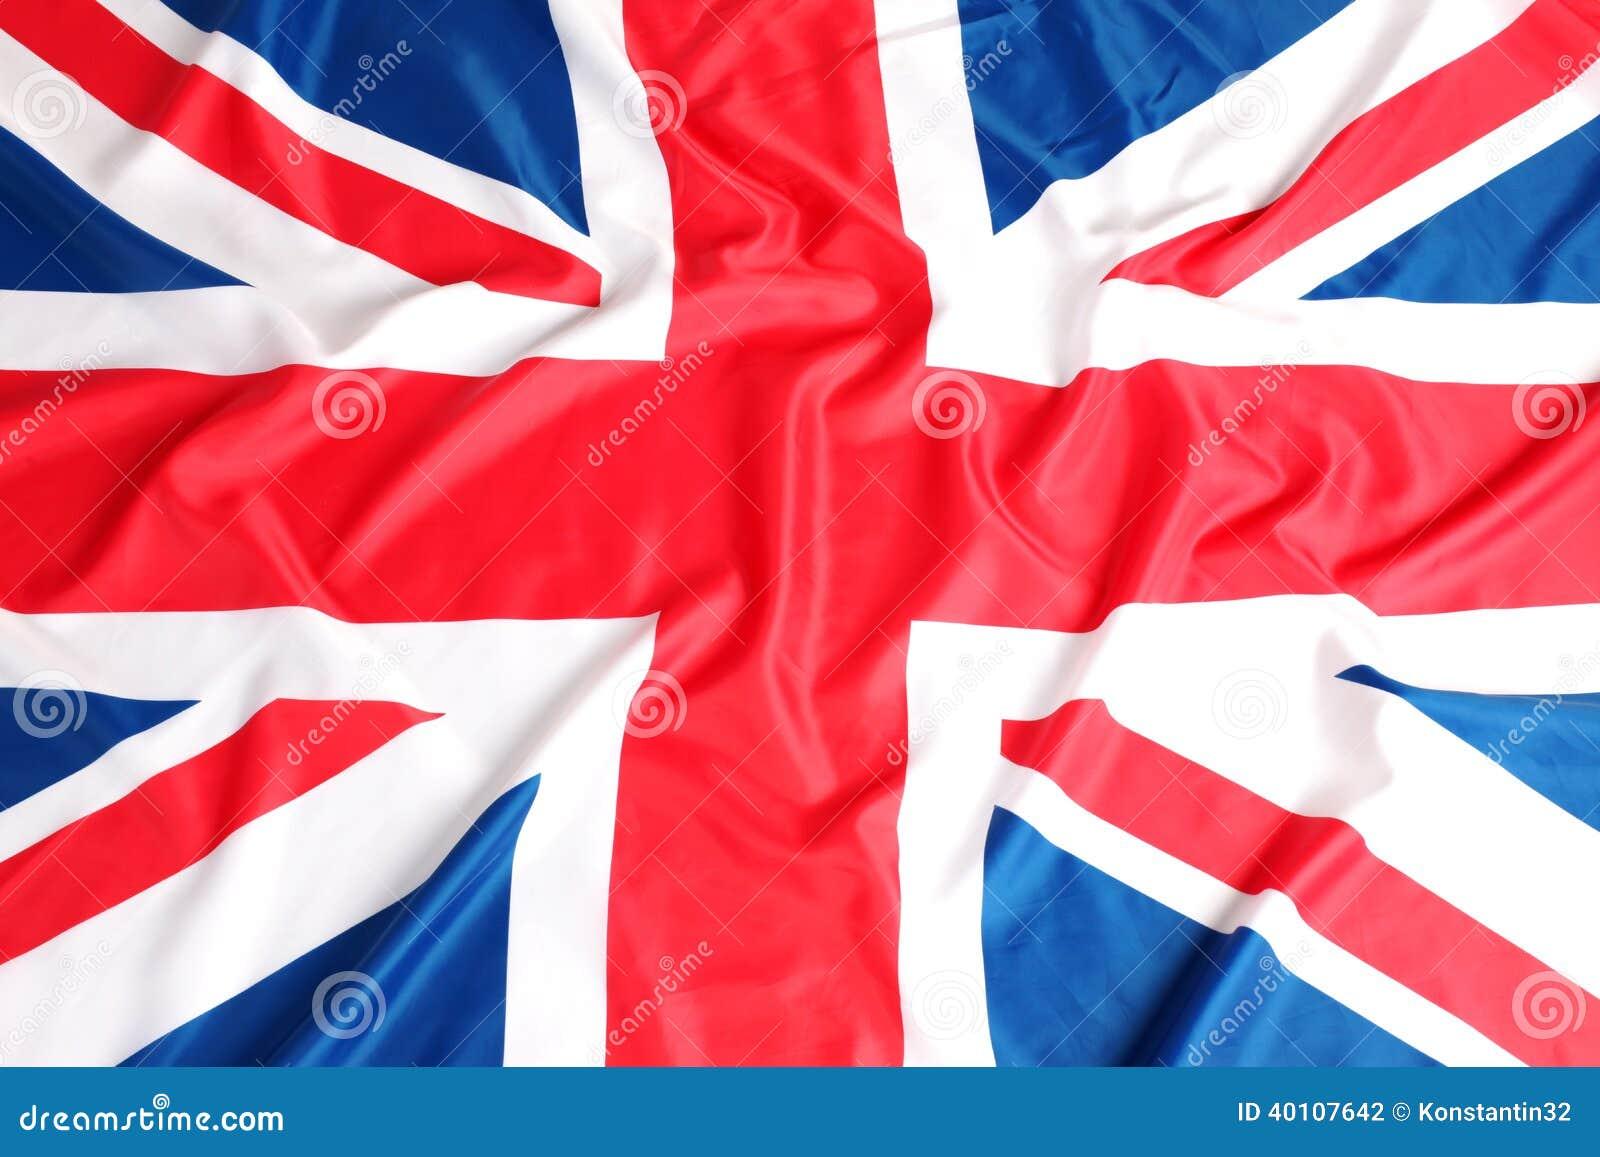 gro britannien britische flagge union jack stockfoto. Black Bedroom Furniture Sets. Home Design Ideas